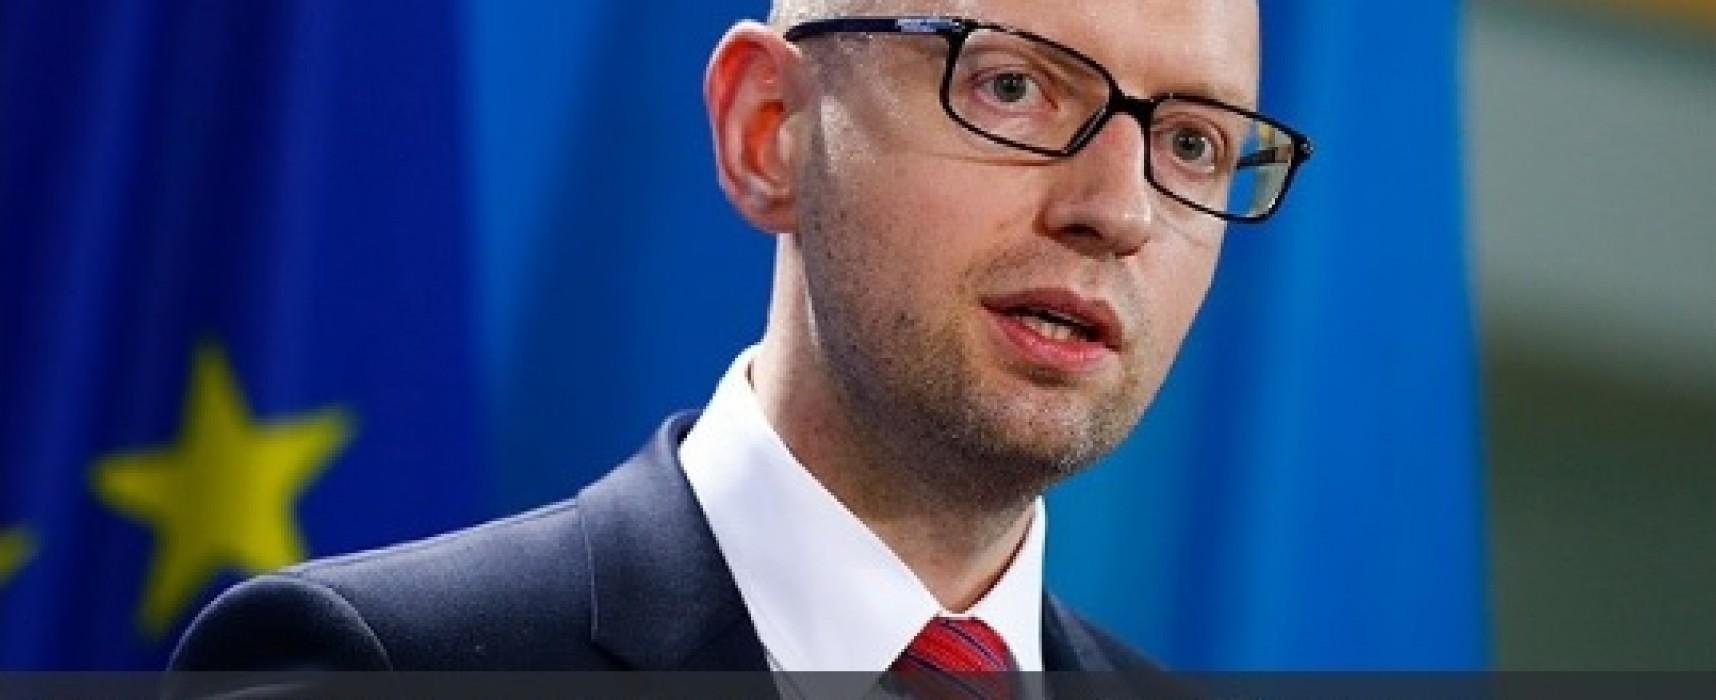 "Fake: Ukrainian Prime Minister called Luhansk and Donetsk people ""untermensch"""